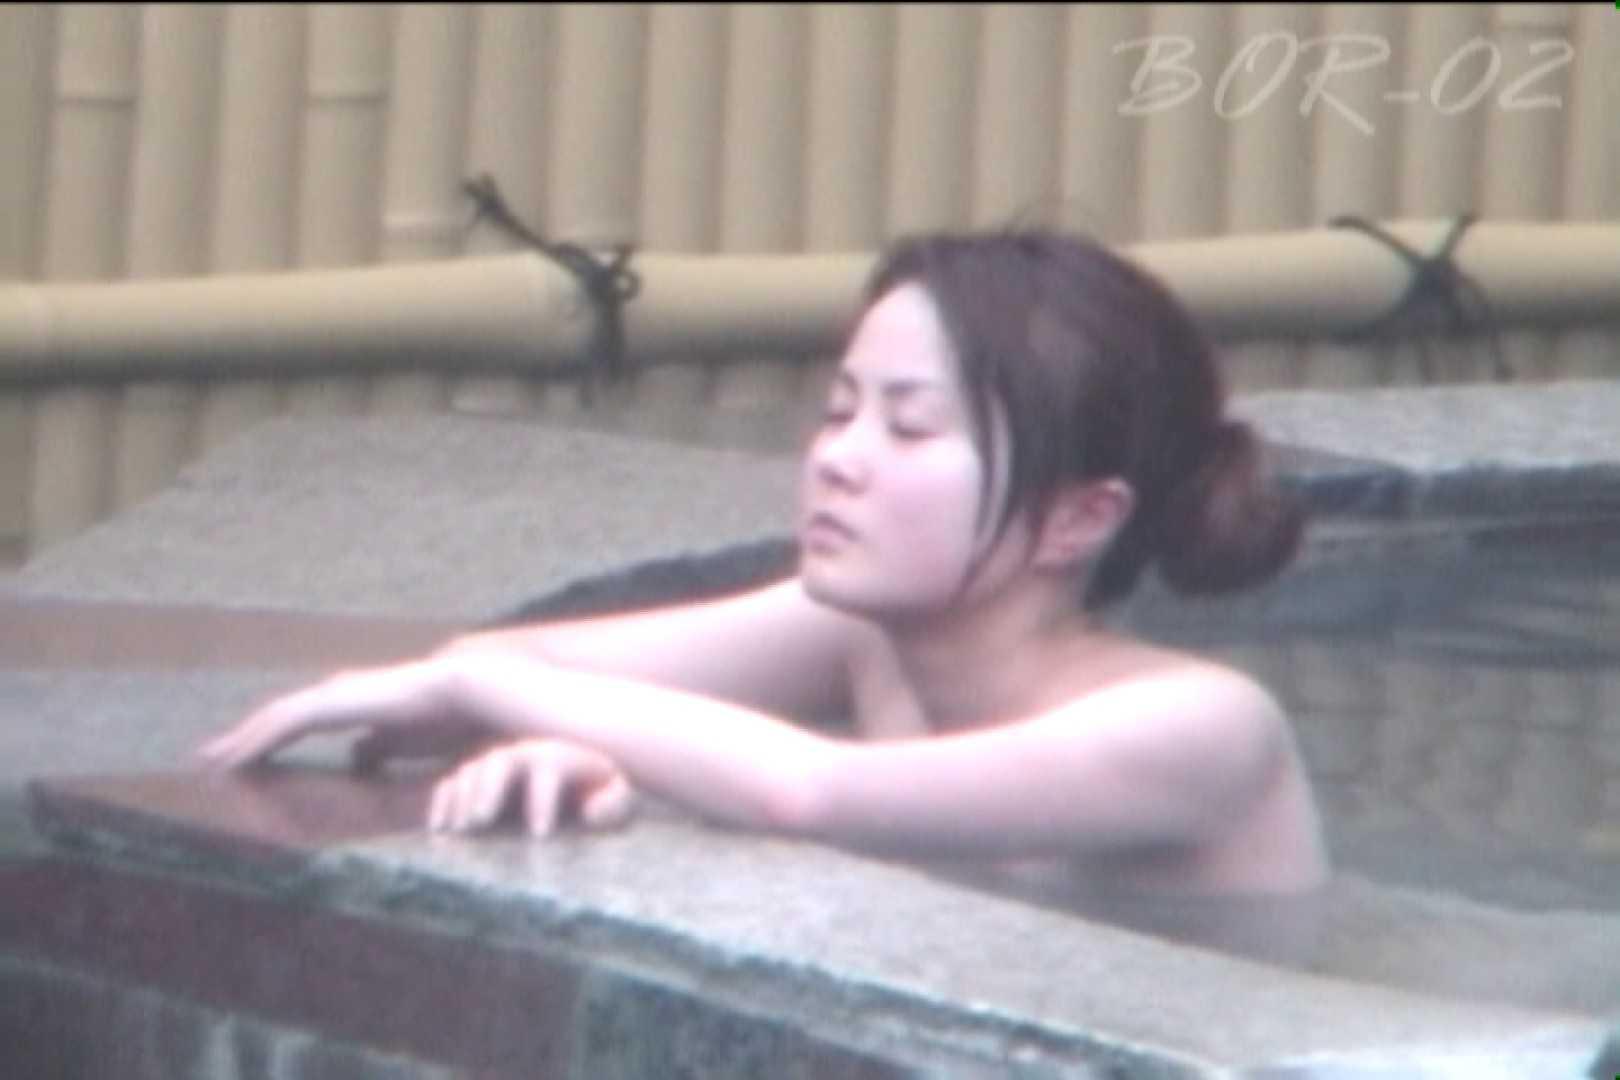 Aquaな露天風呂Vol.474 露天  87連発 48